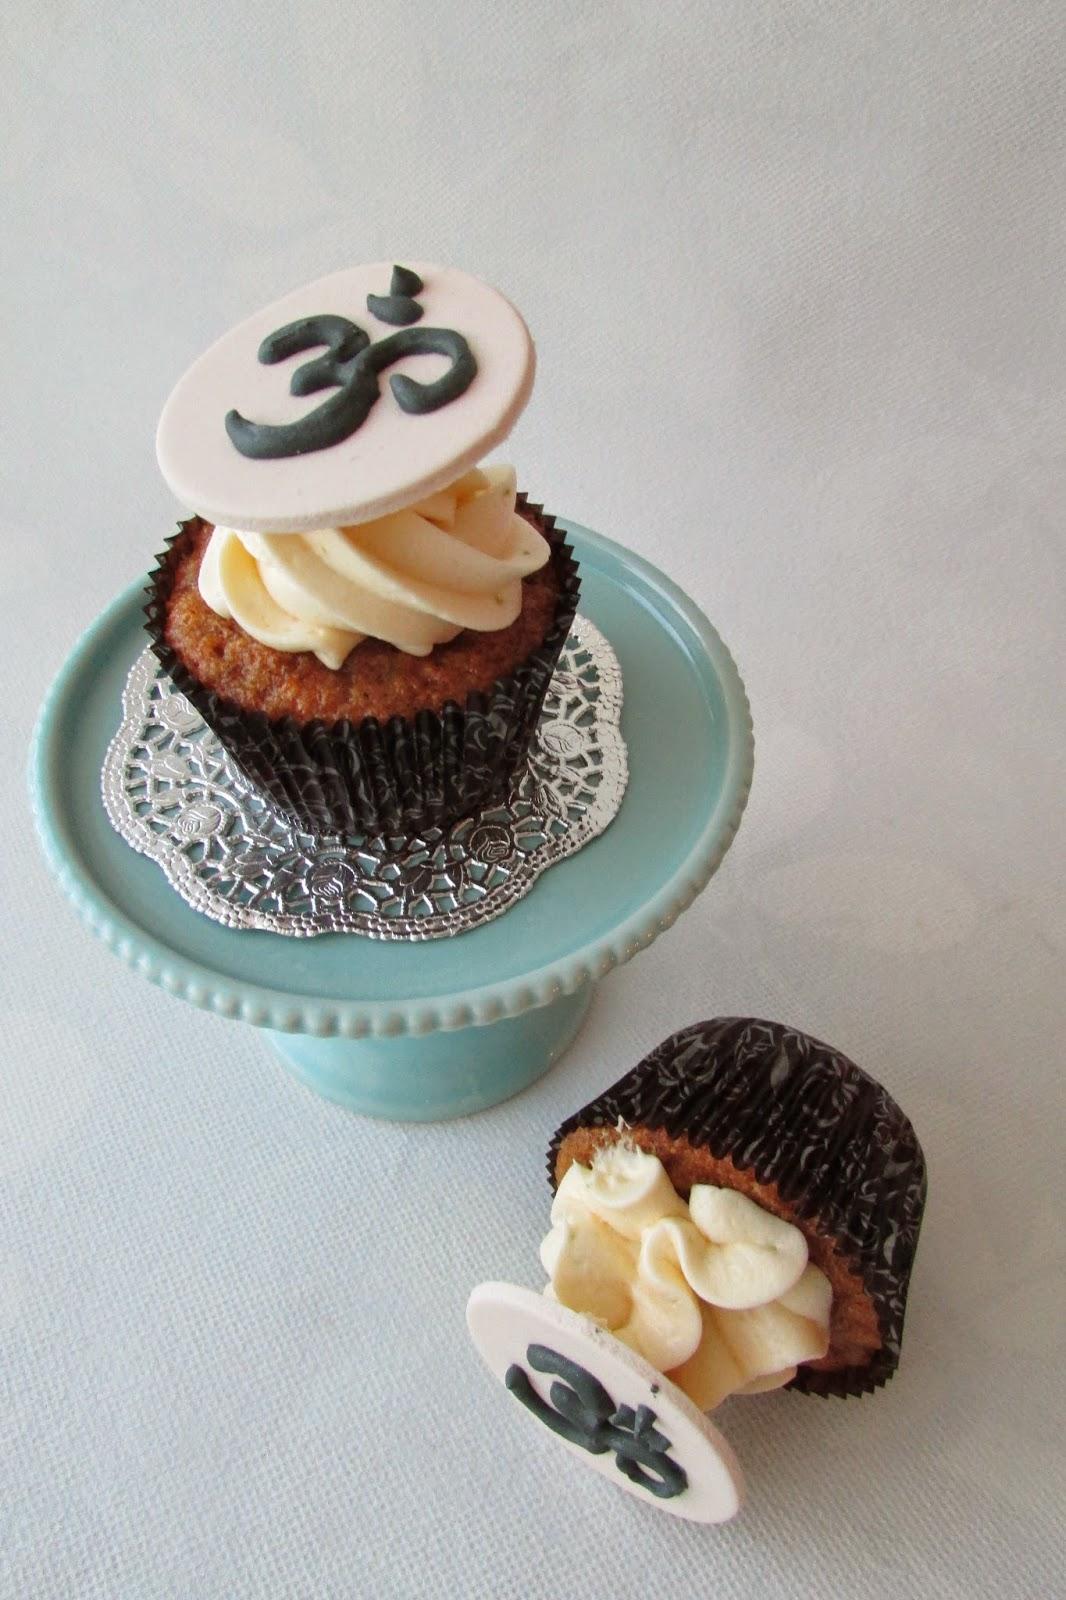 cupcakes-zanahoria-yoga-fondat-royal-icing